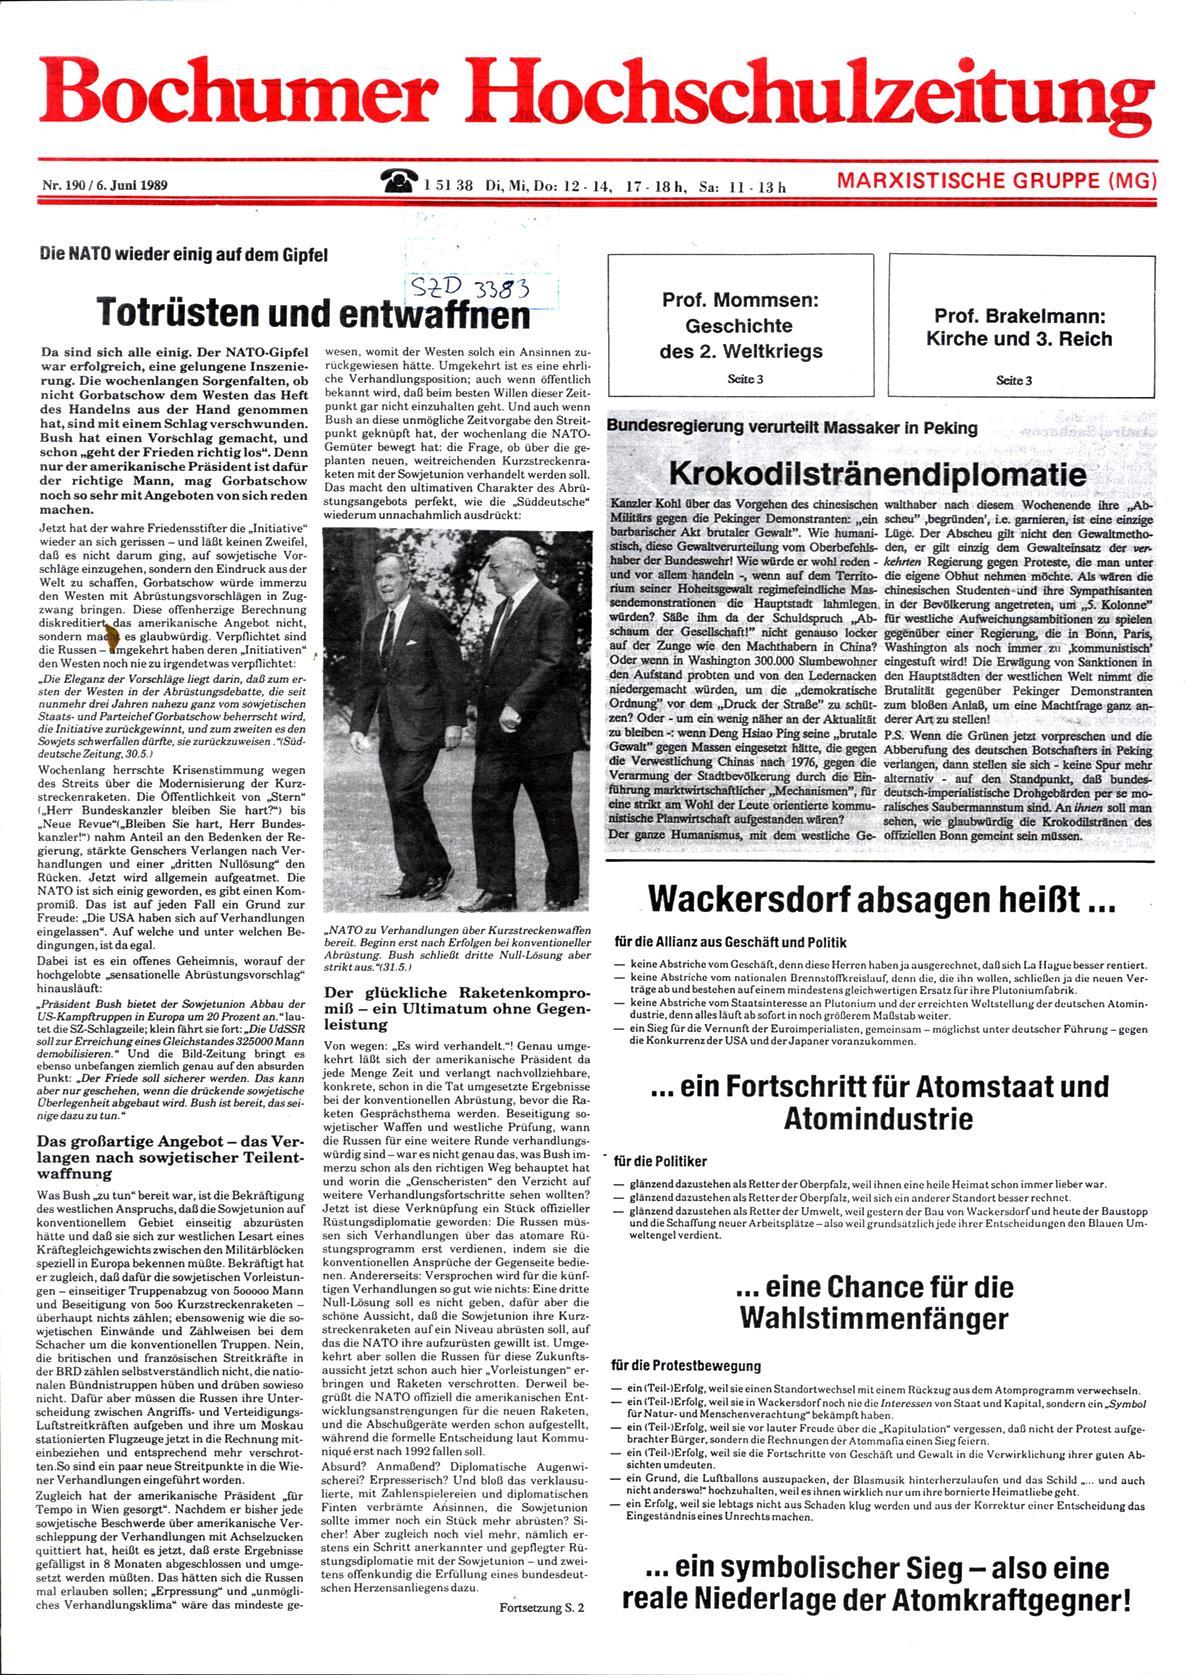 Bochum_BHZ_19890606_190_001